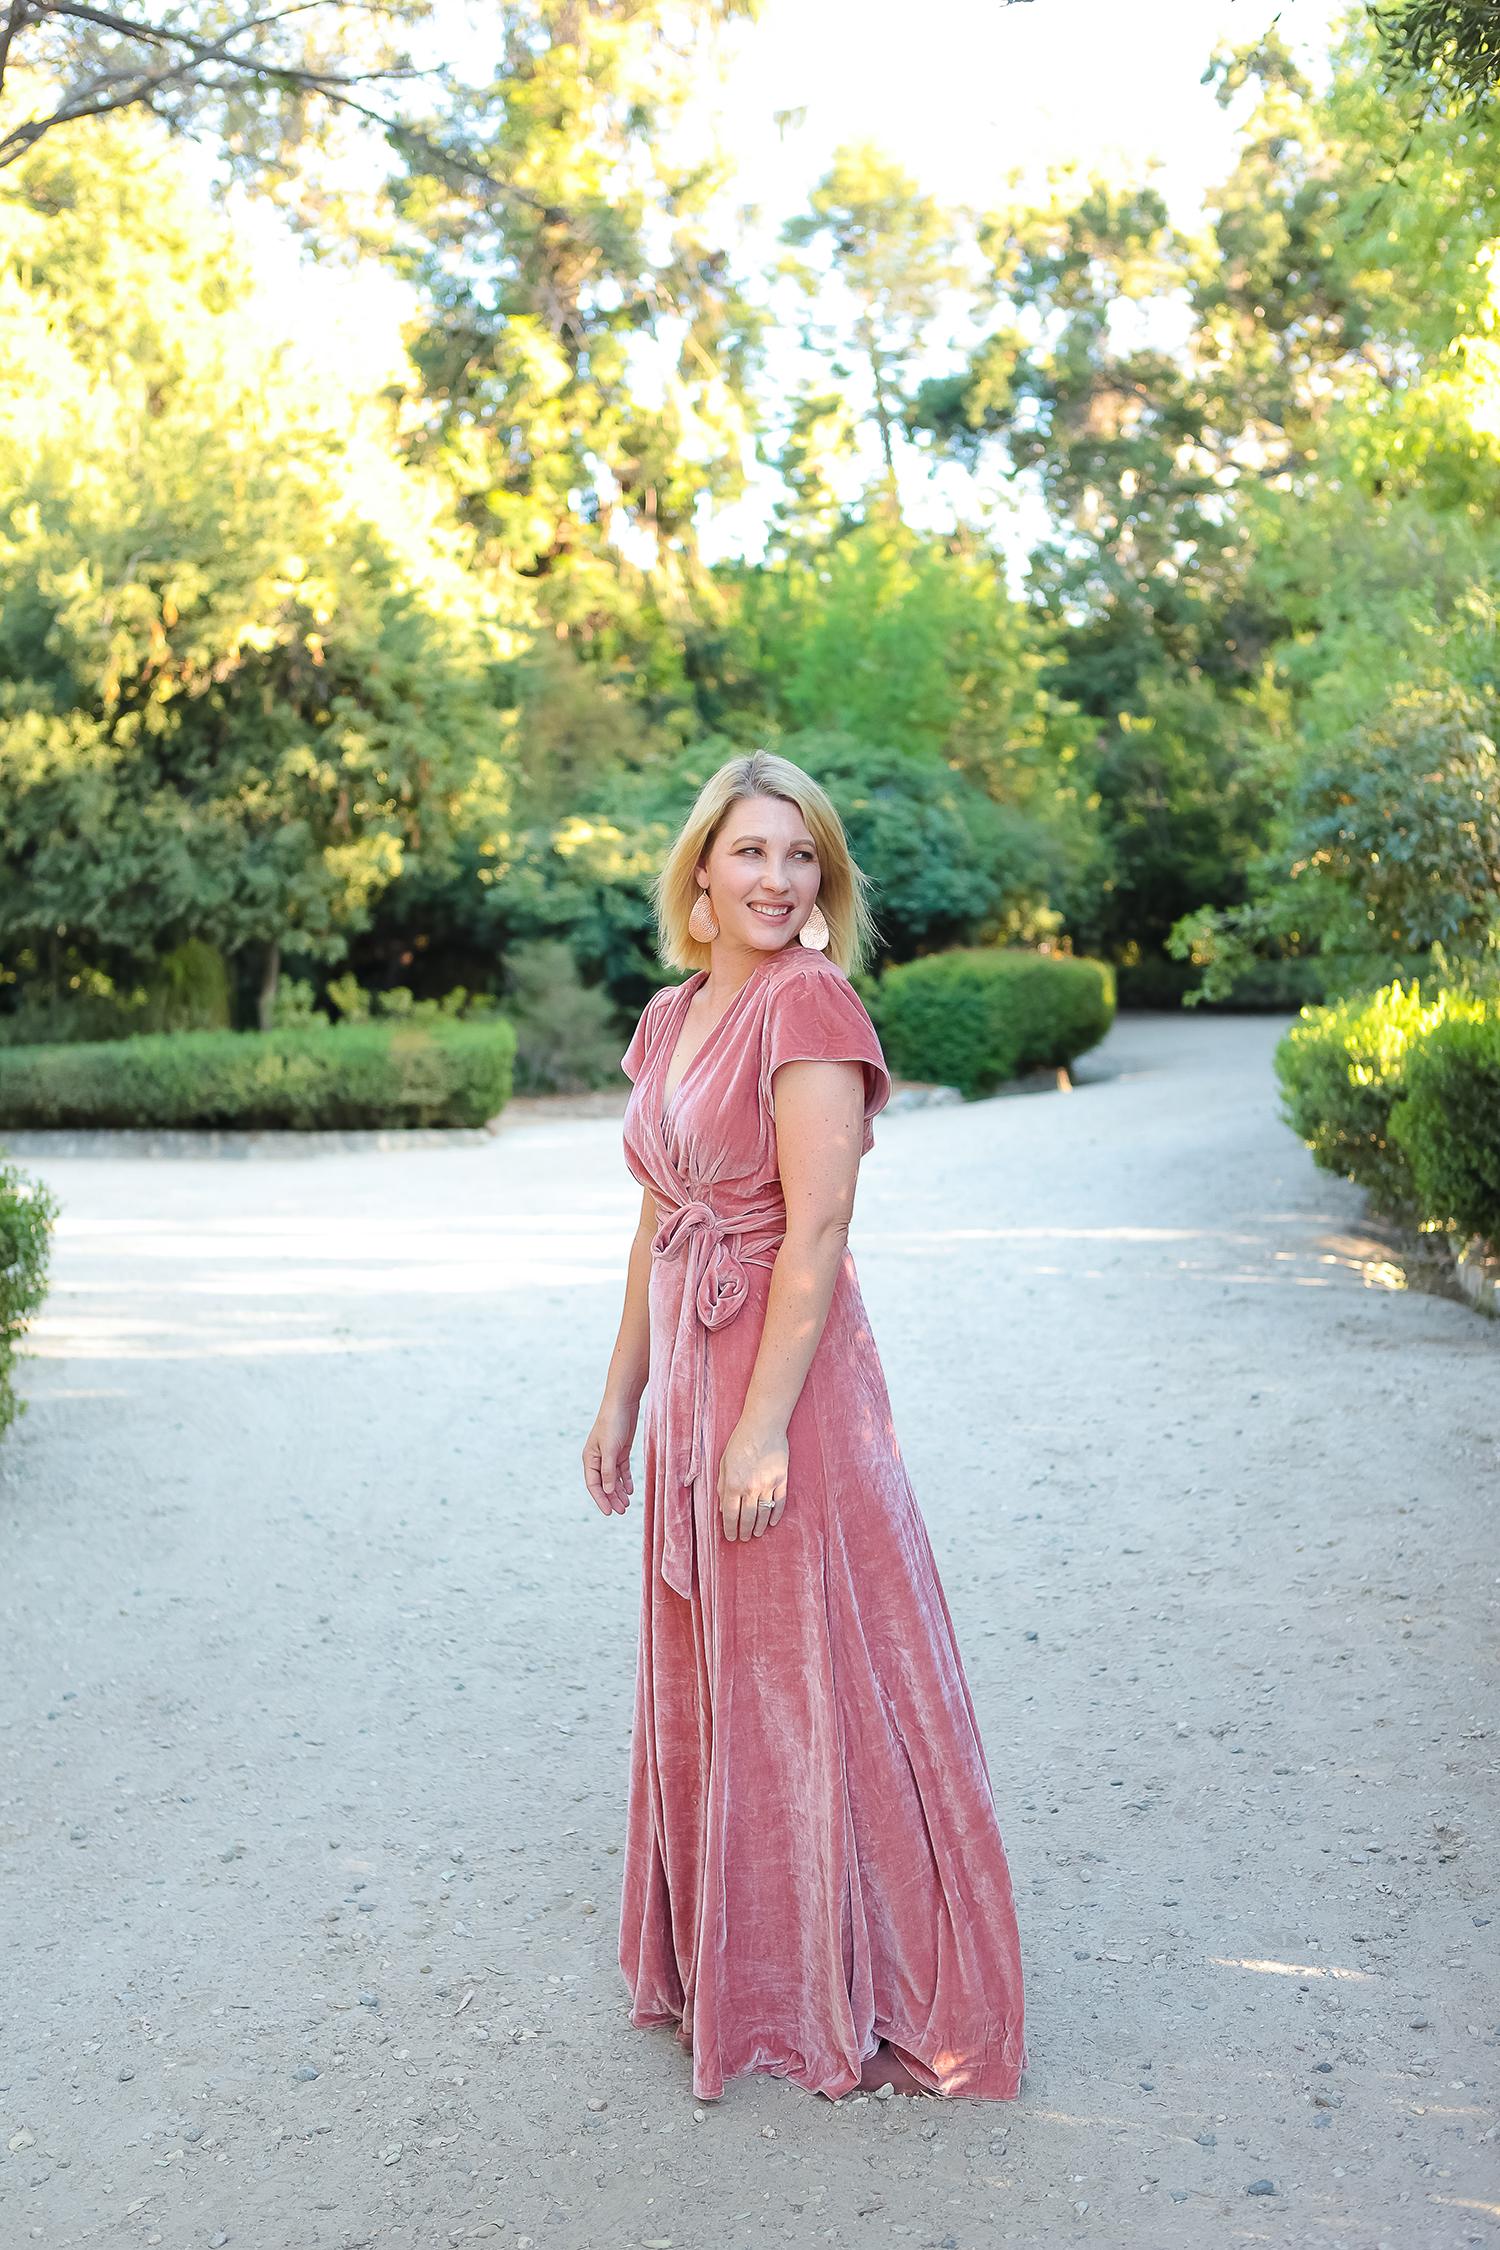 Holiday Dresses 2017: I love this pink velvet maxi dress!